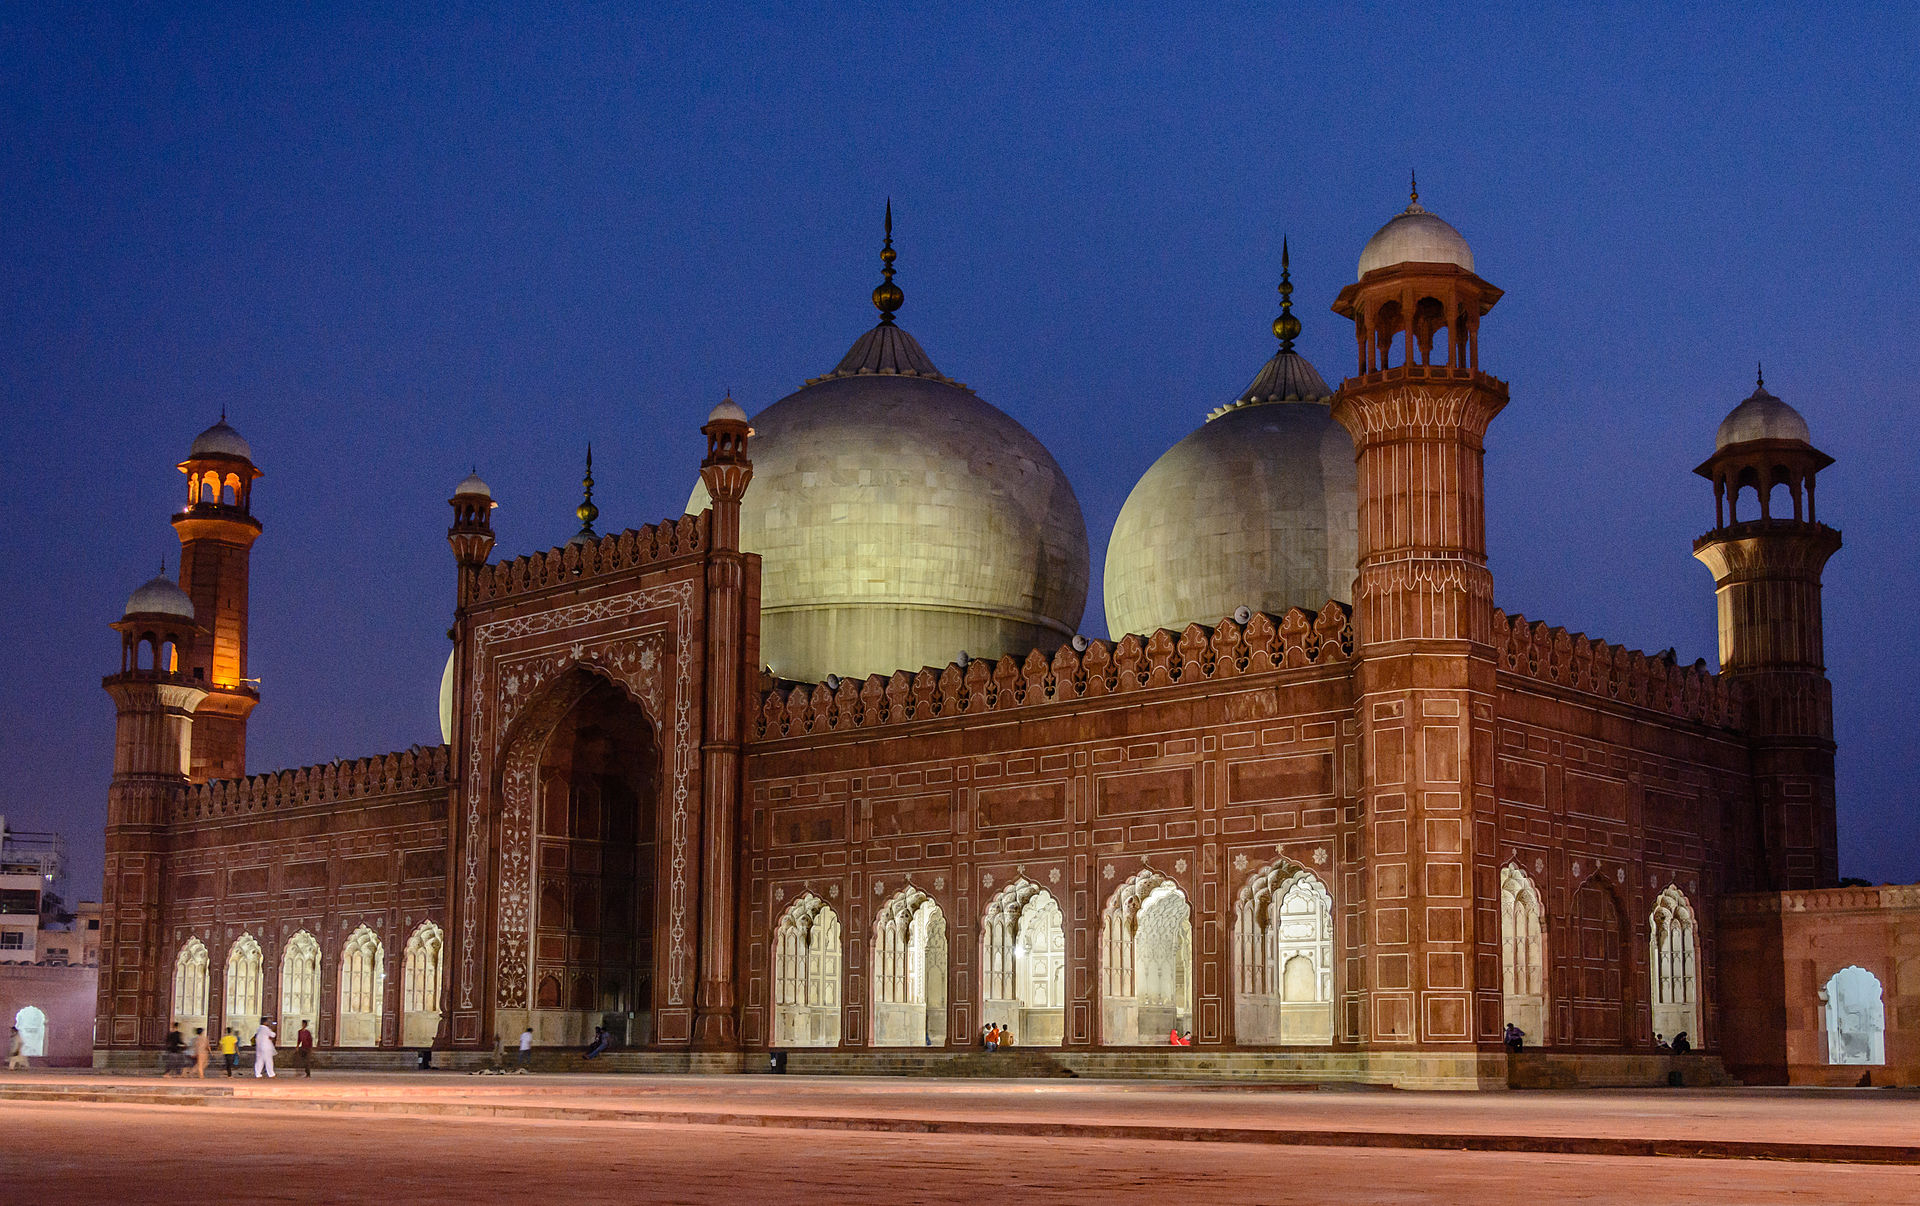 _1920px-Night_View_of_Badshahi_Mosque__28King_E2_80_99s_Mosque_29_8462166754427127346.jpg